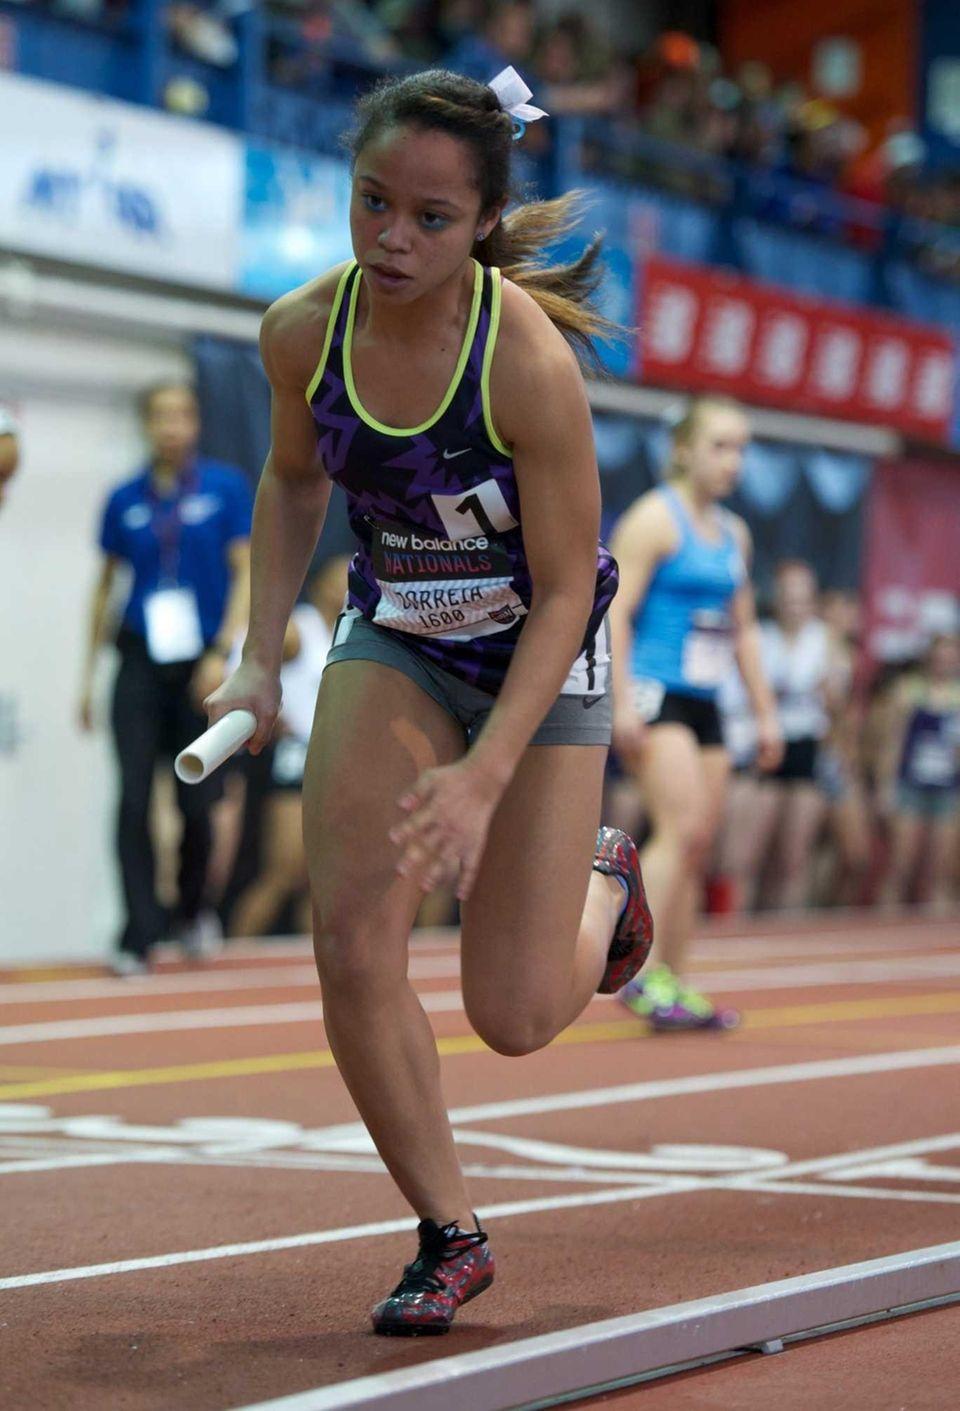 Danielle Correia runs as part of the Kellenberg